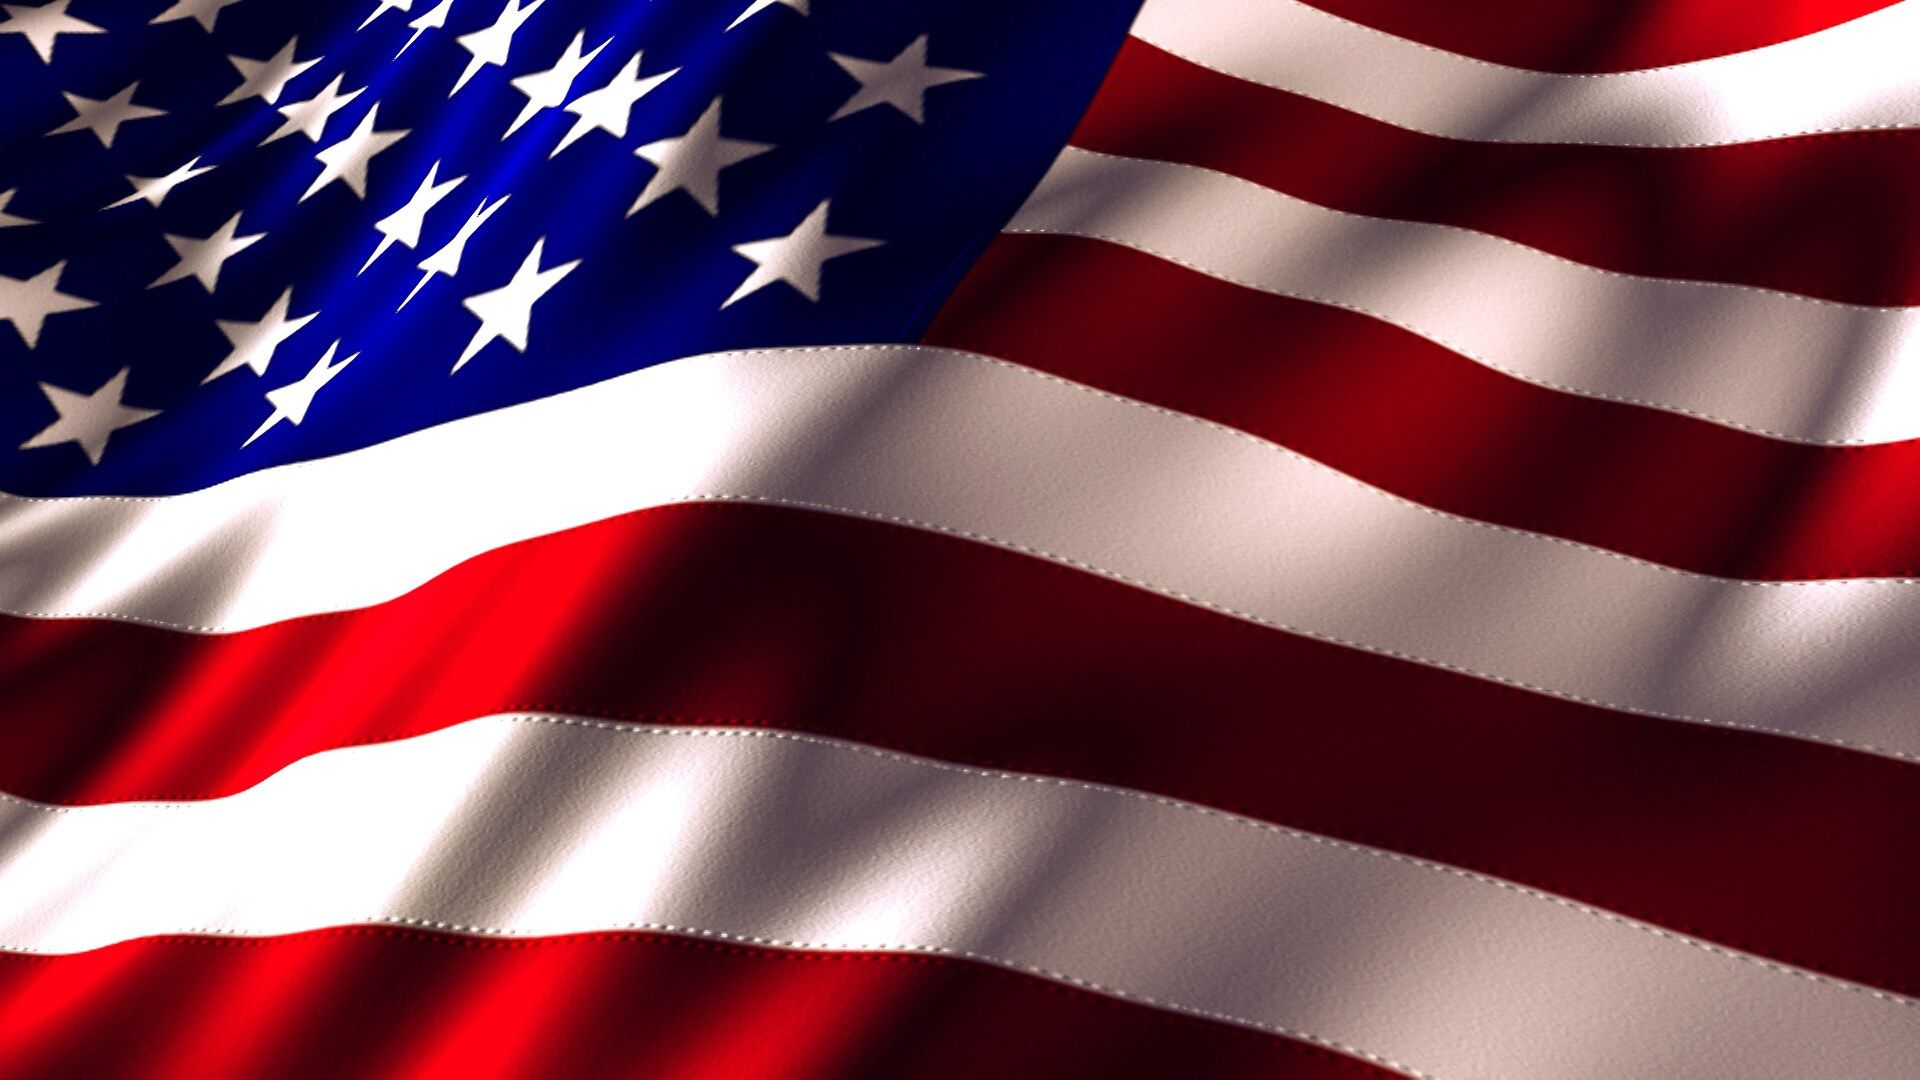 american flag wallpaper hd pack | American flag wallpaper ...